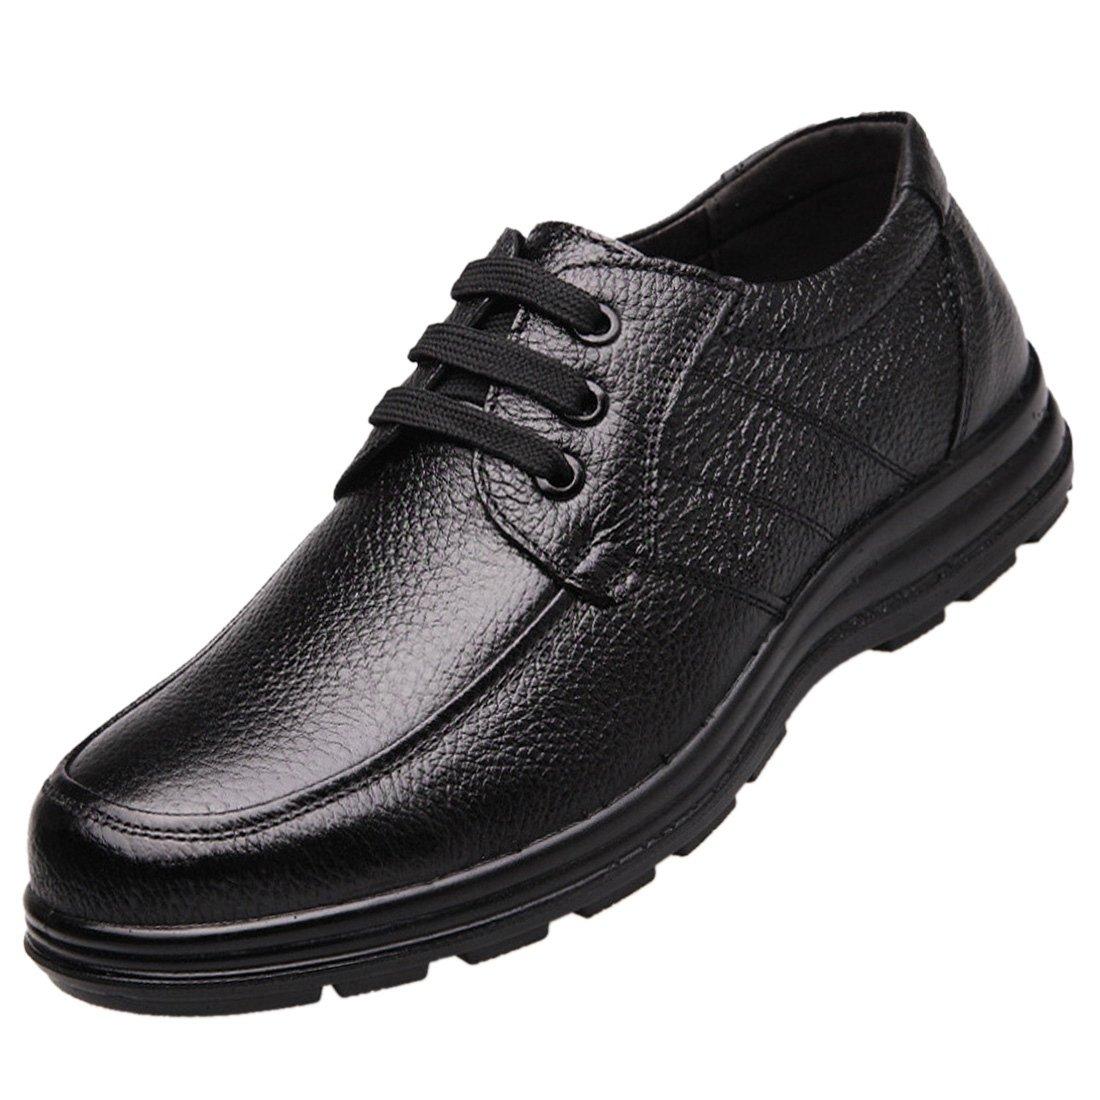 Enerhu Men Lace-up Chef Shoe Leather Flat Work Shoe Nonslip Oil Resistant Waterproof Black Asian 42/US 8.5